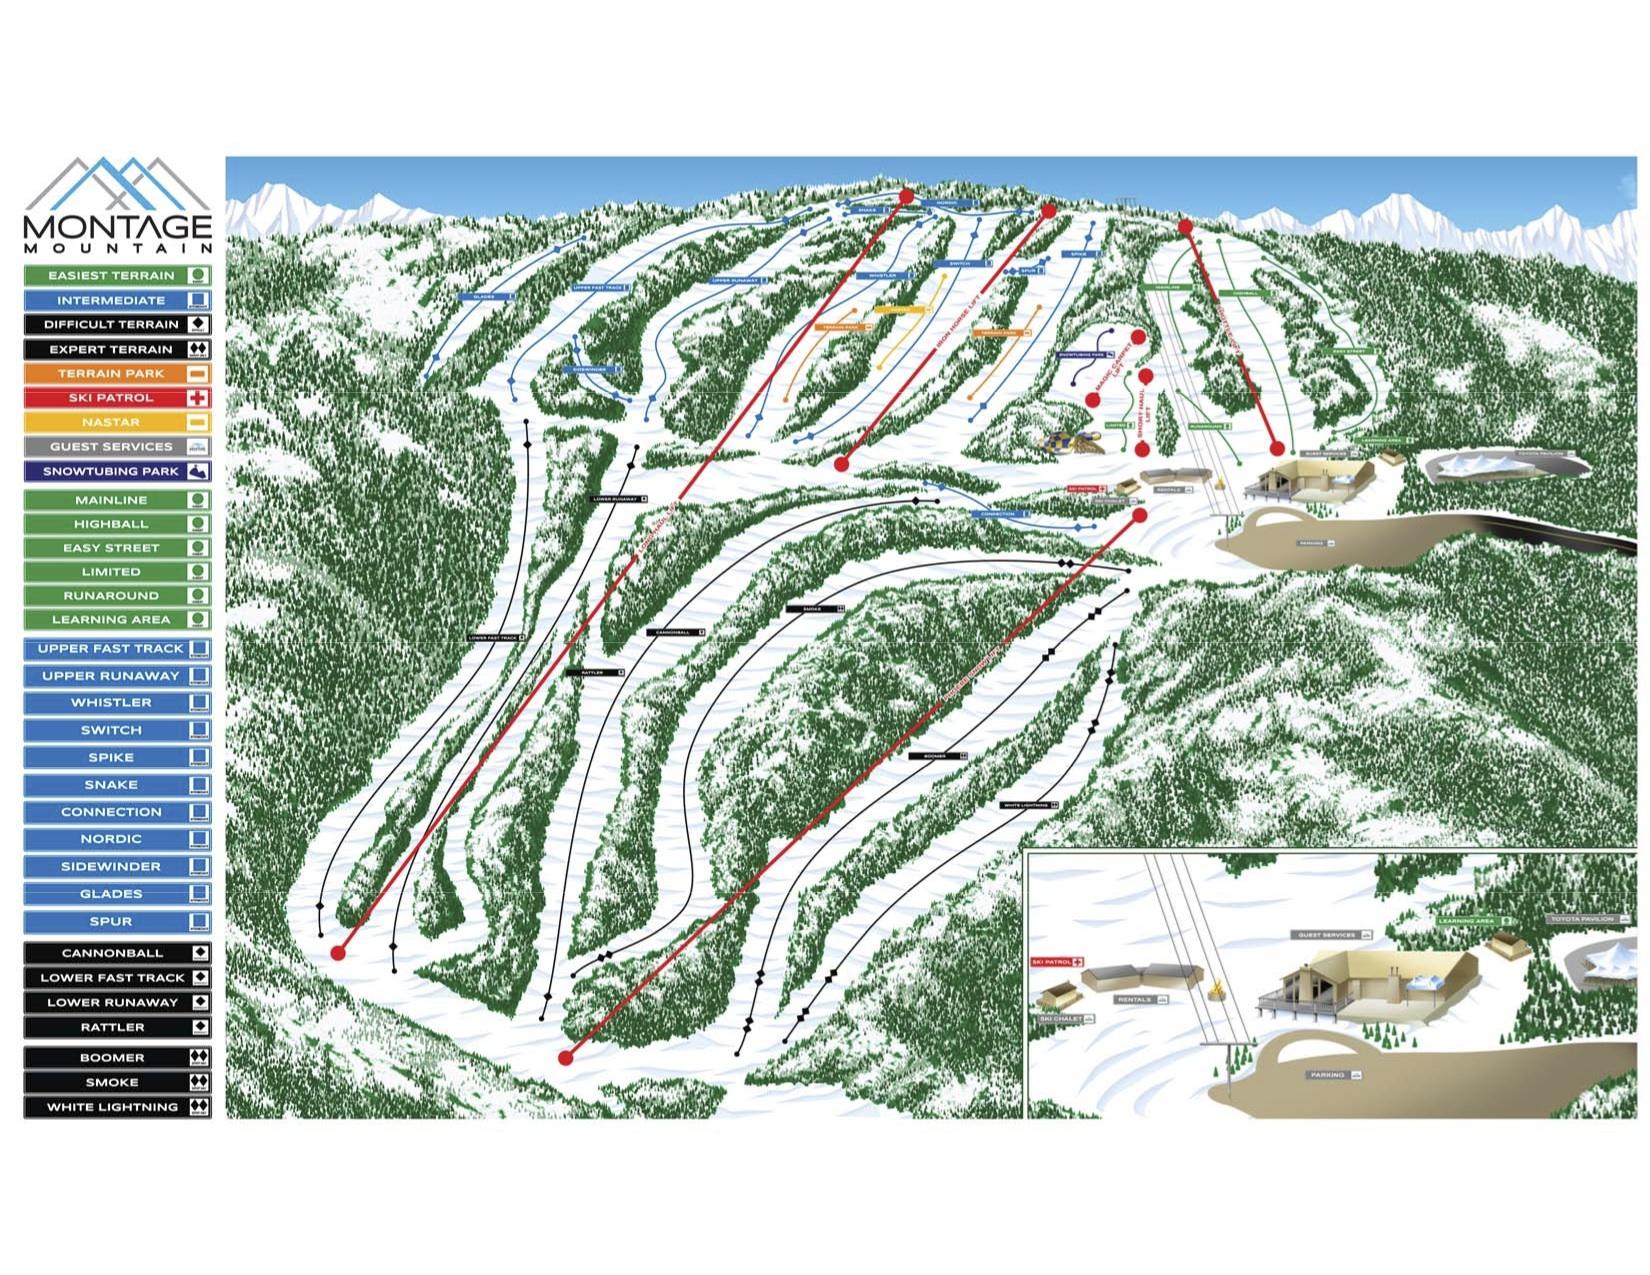 Montage Mountain Resorts Piste / Trail Map